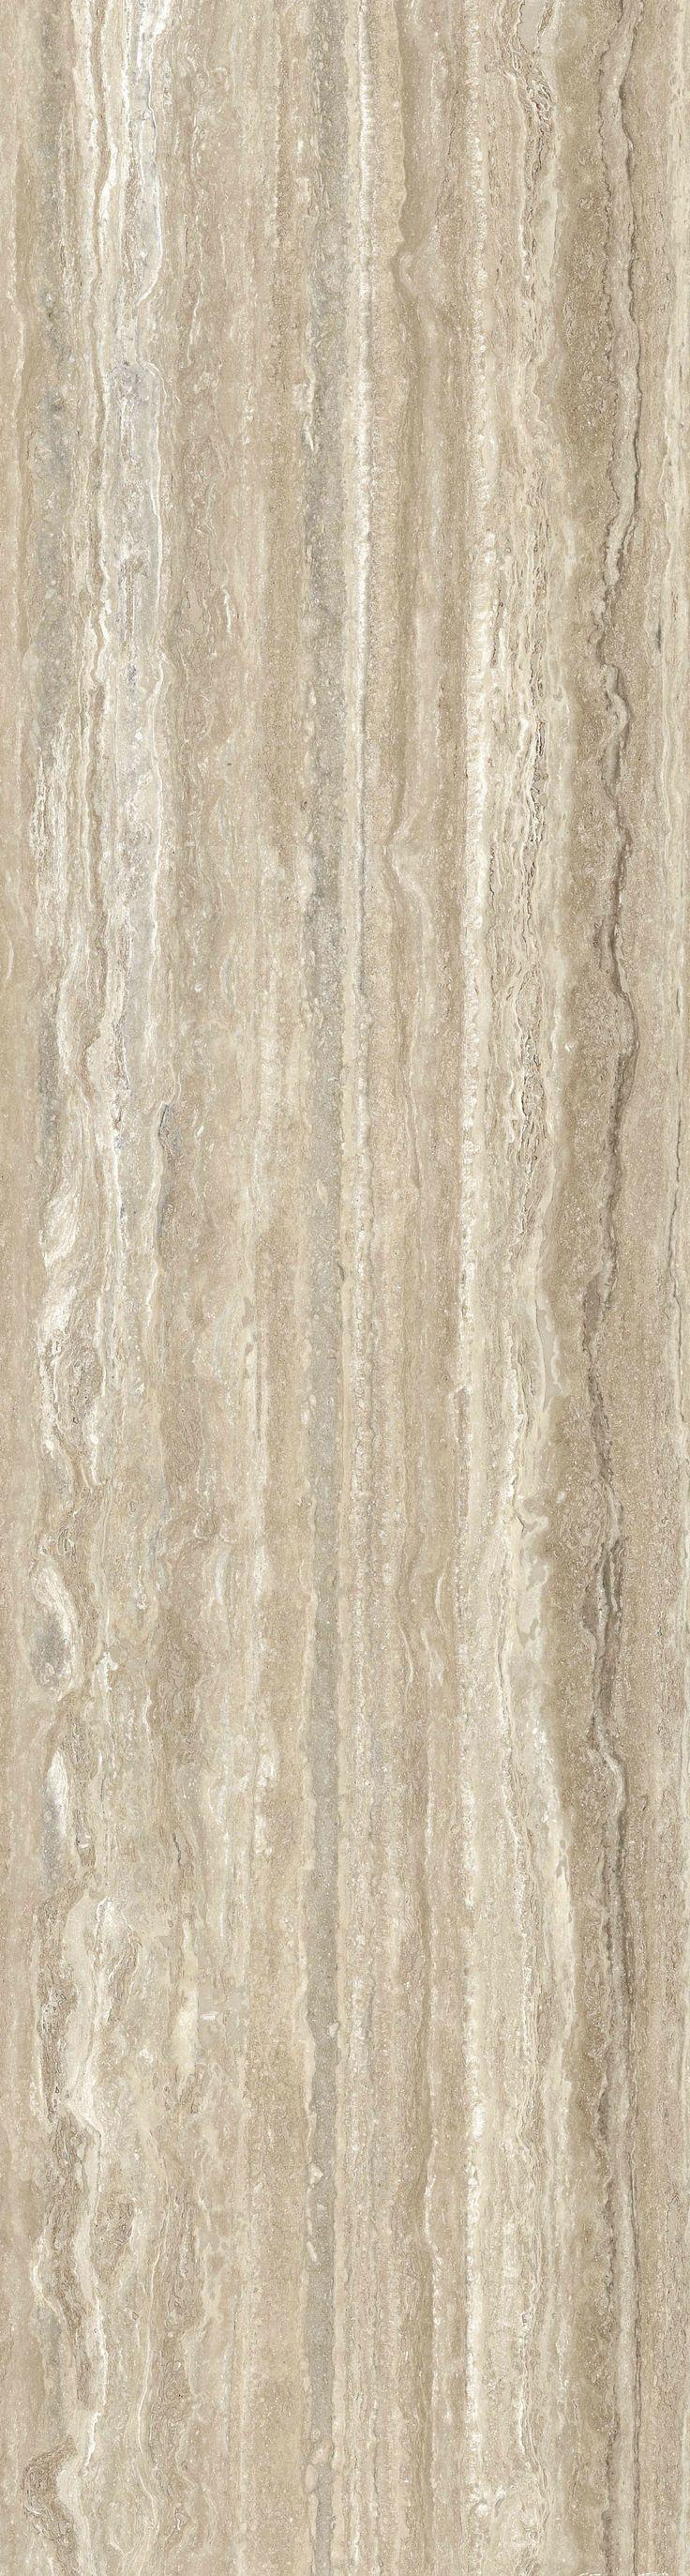 M S De 25 Ideas Incre Bles Sobre Textura Marmol En